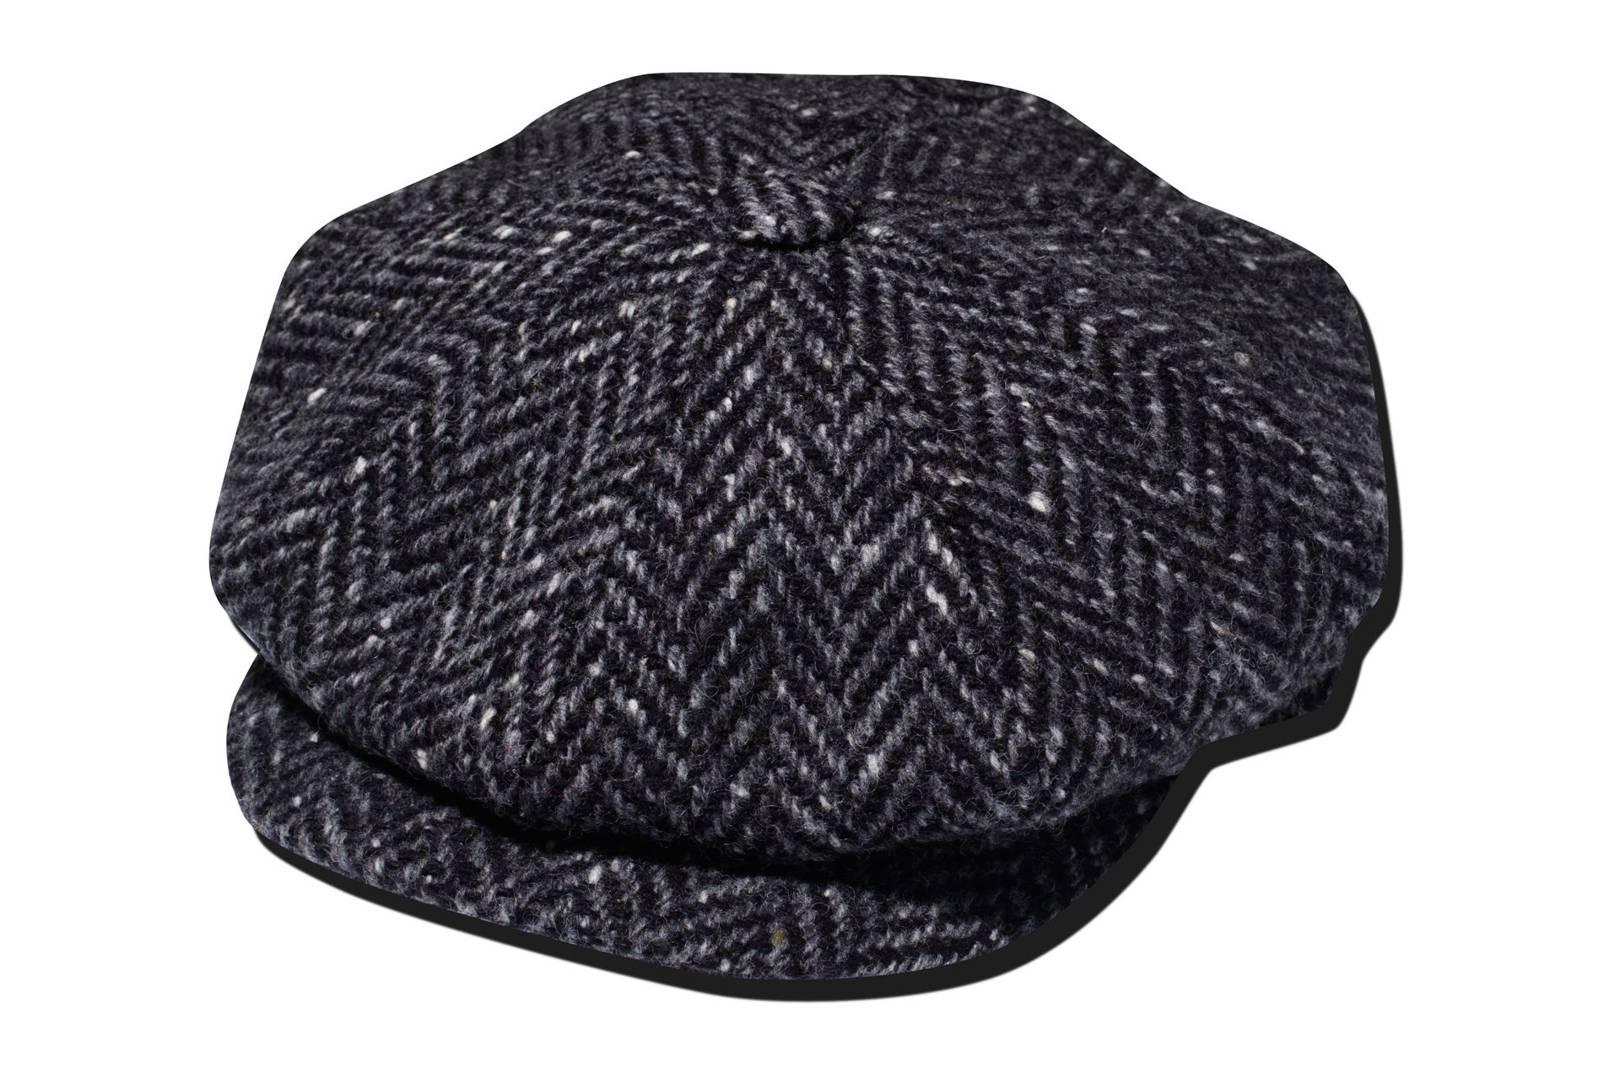 282e385f7c479a Gucci Mens Hats Sale